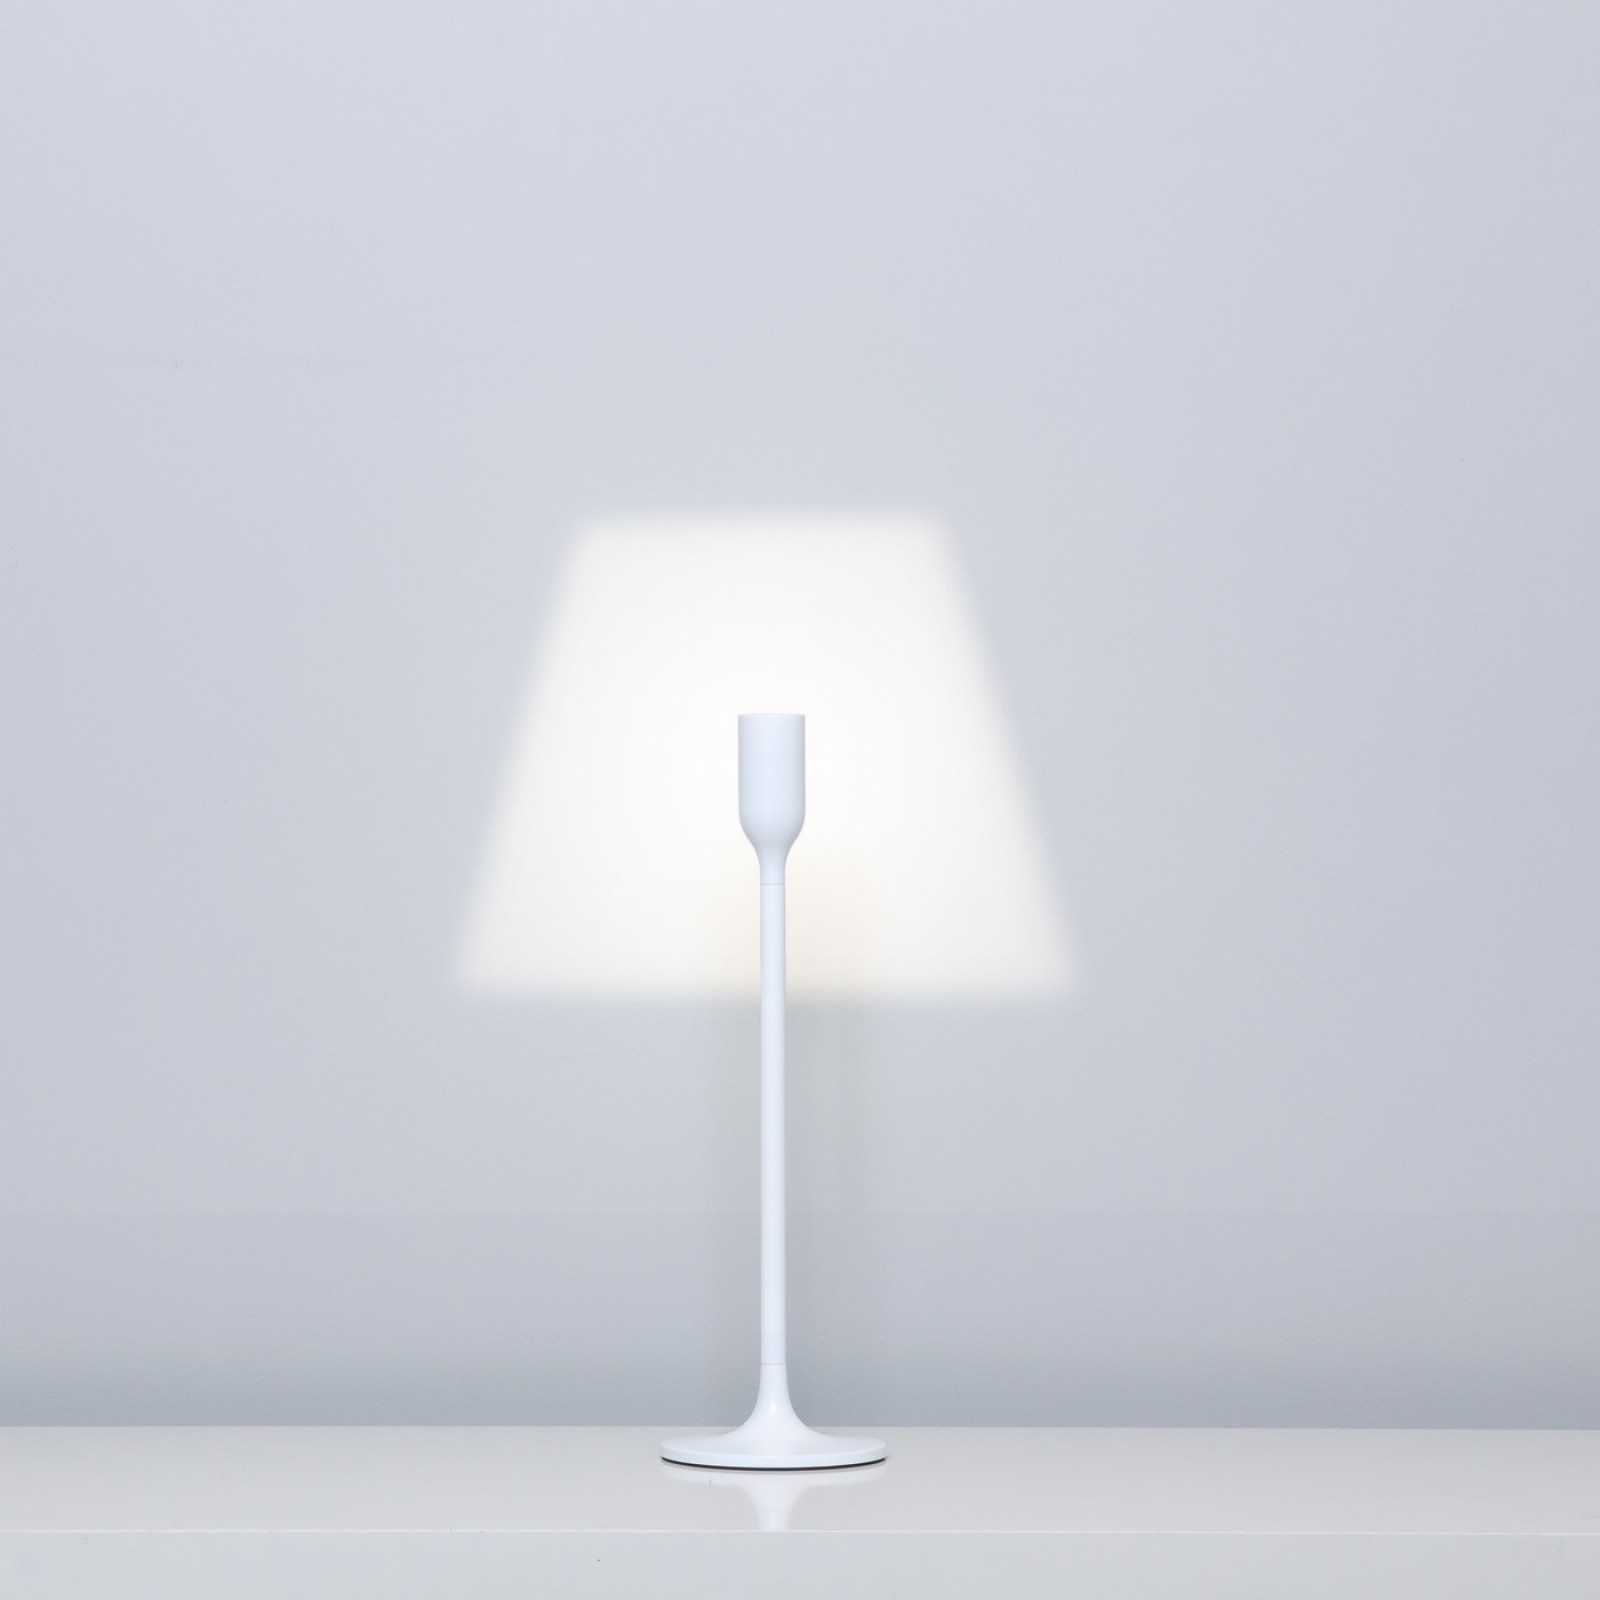 YOY Light Table Lamp - Innermost